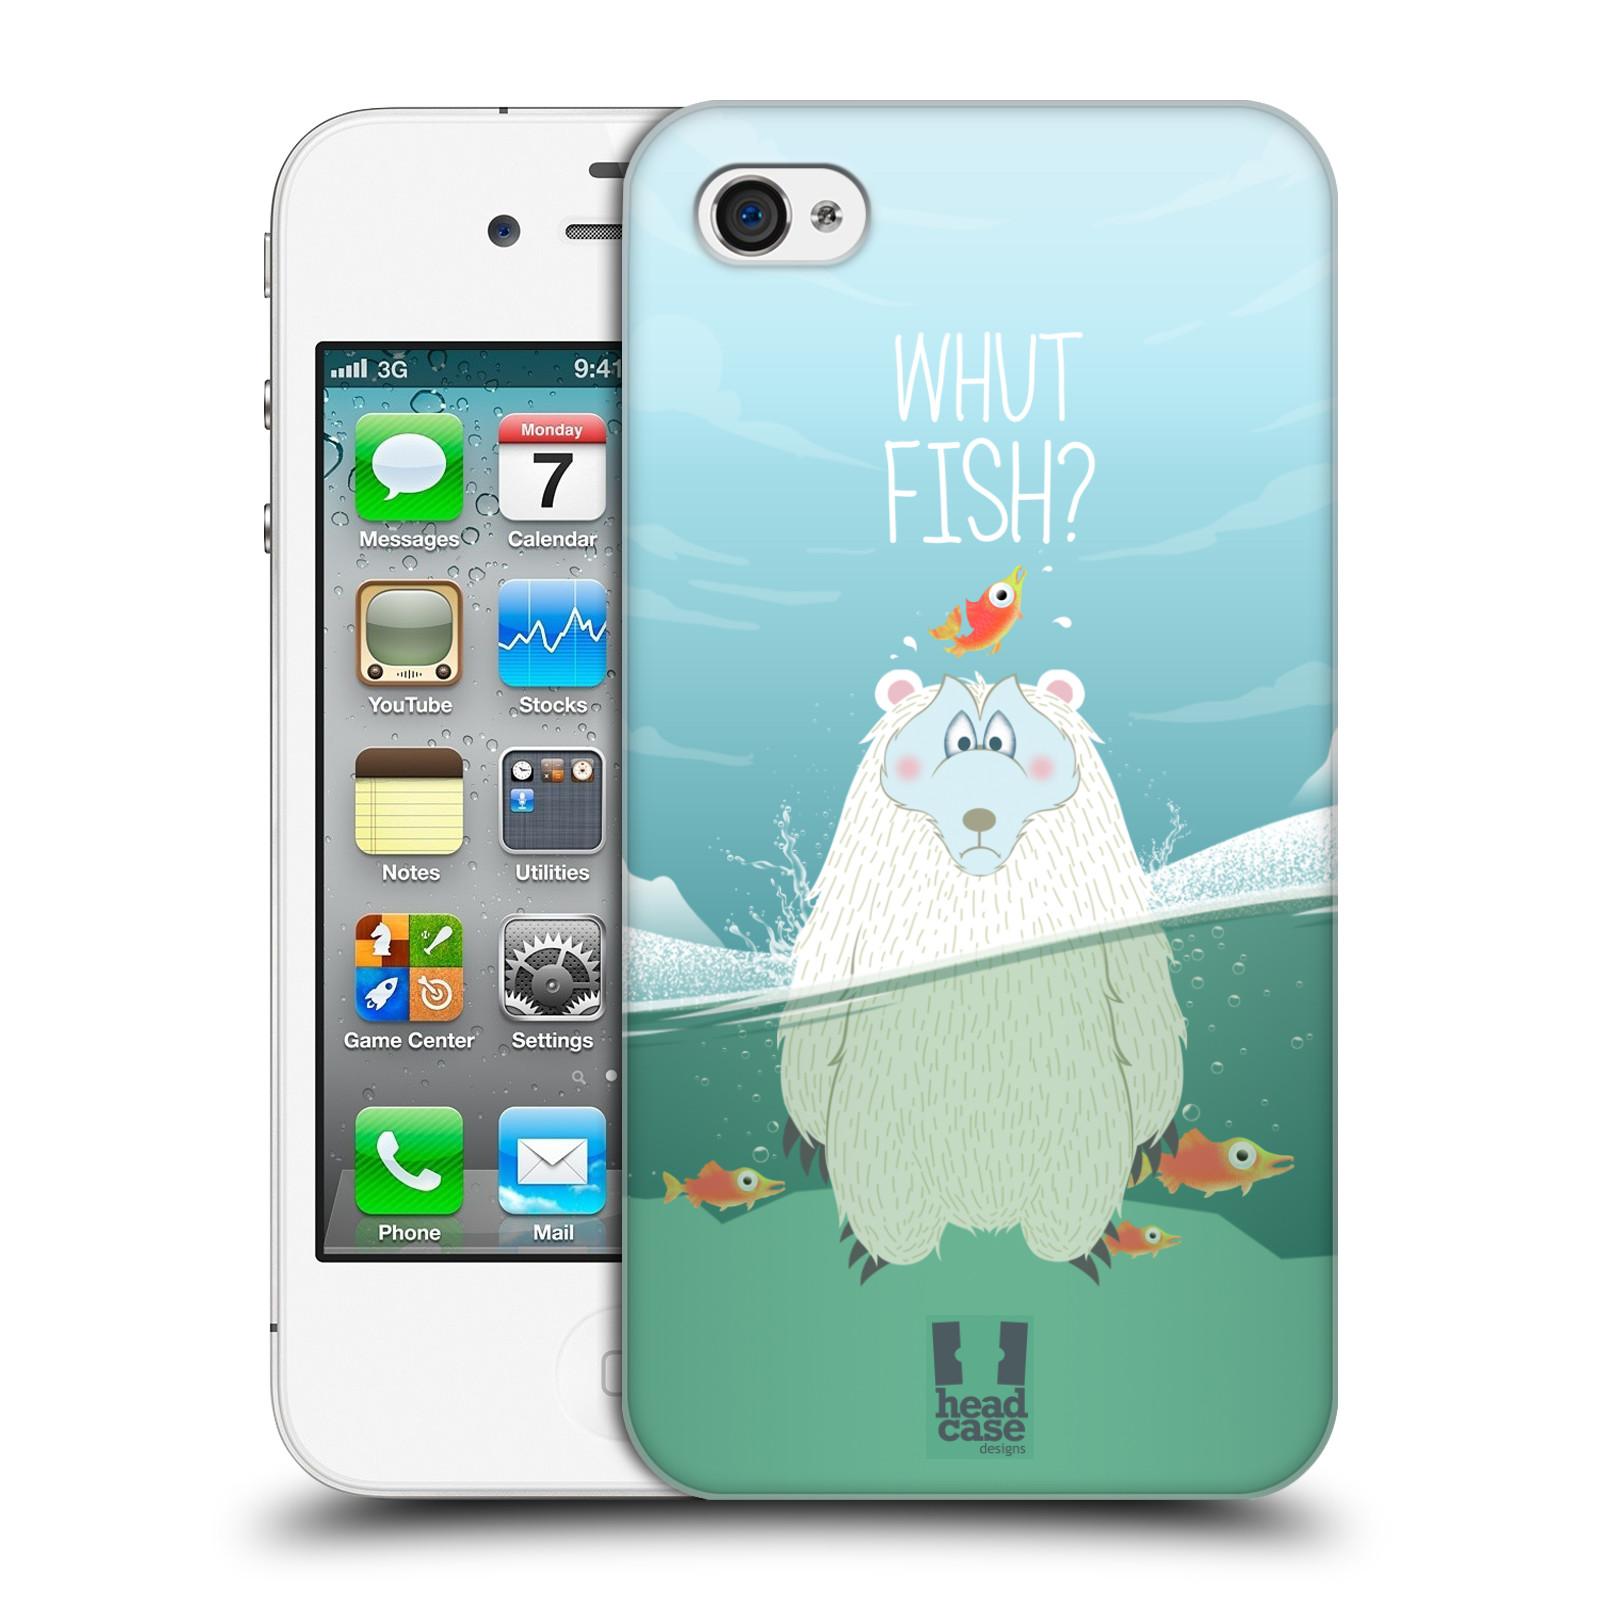 Plastové pouzdro na mobil Apple iPhone 4 a 4S HEAD CASE Medvěd Whut Fish?